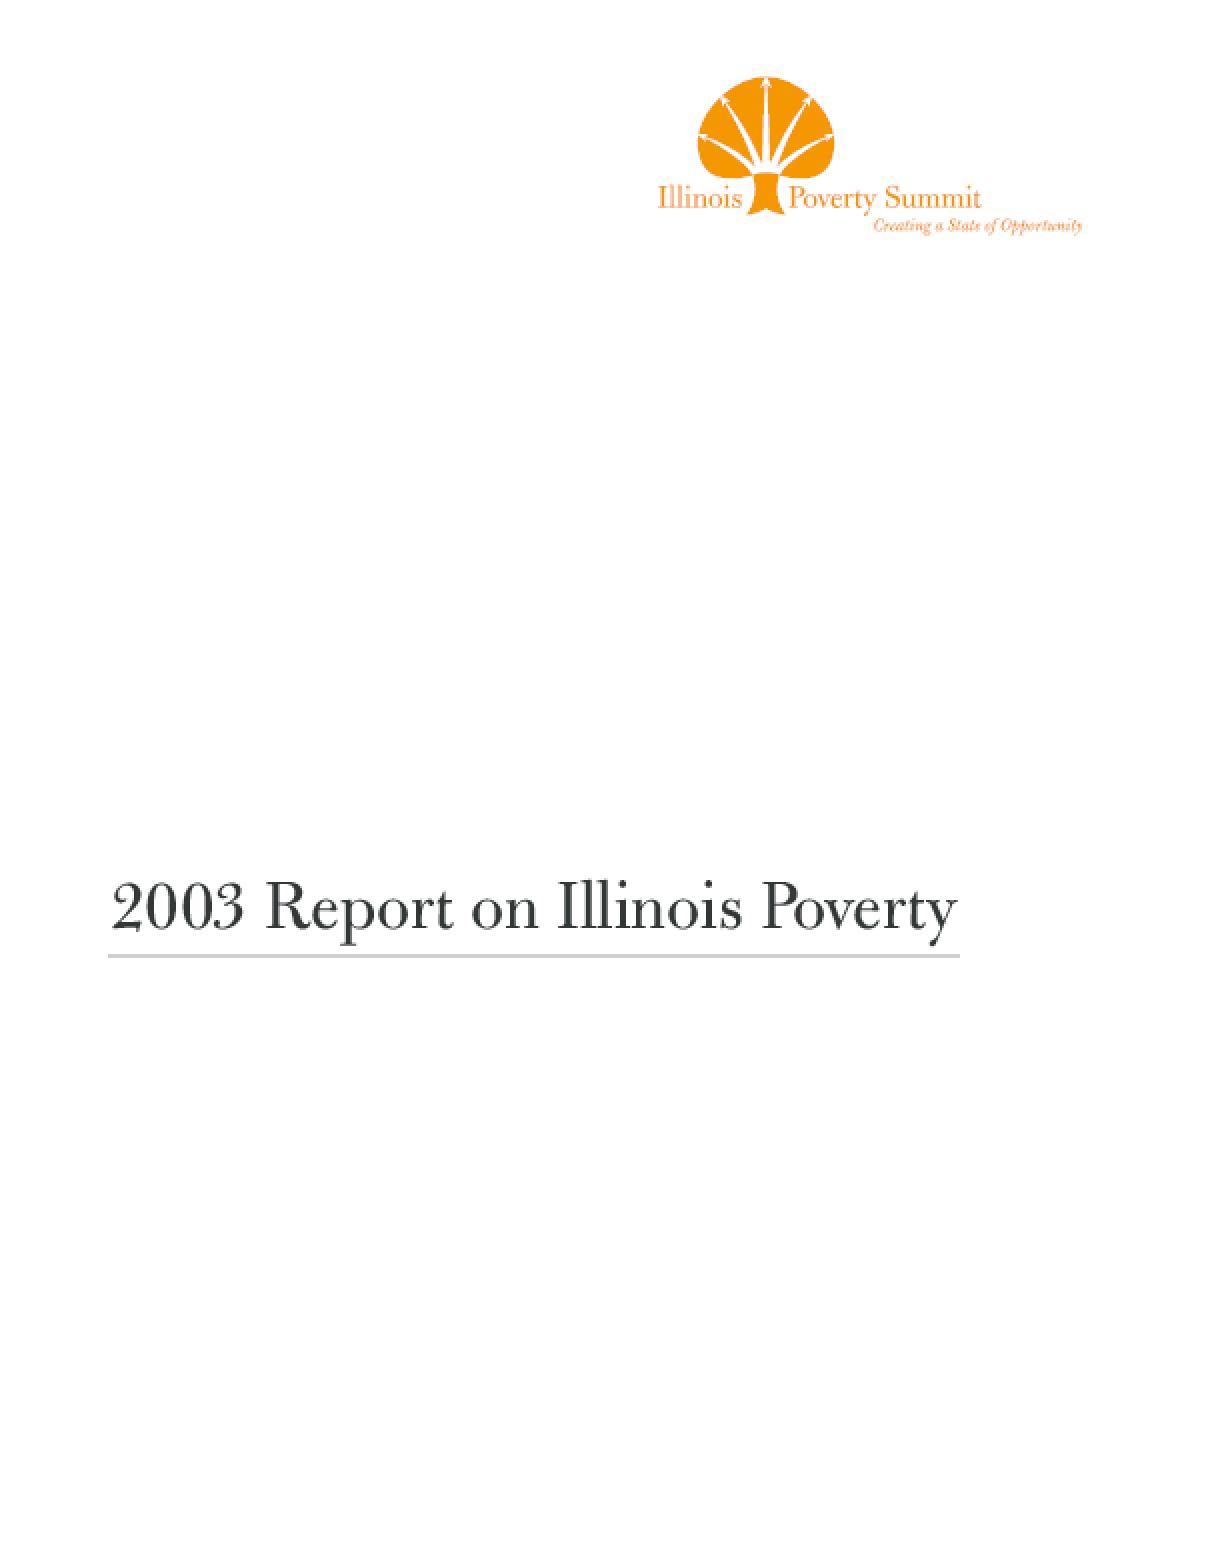 2003 Report on Illinois Poverty